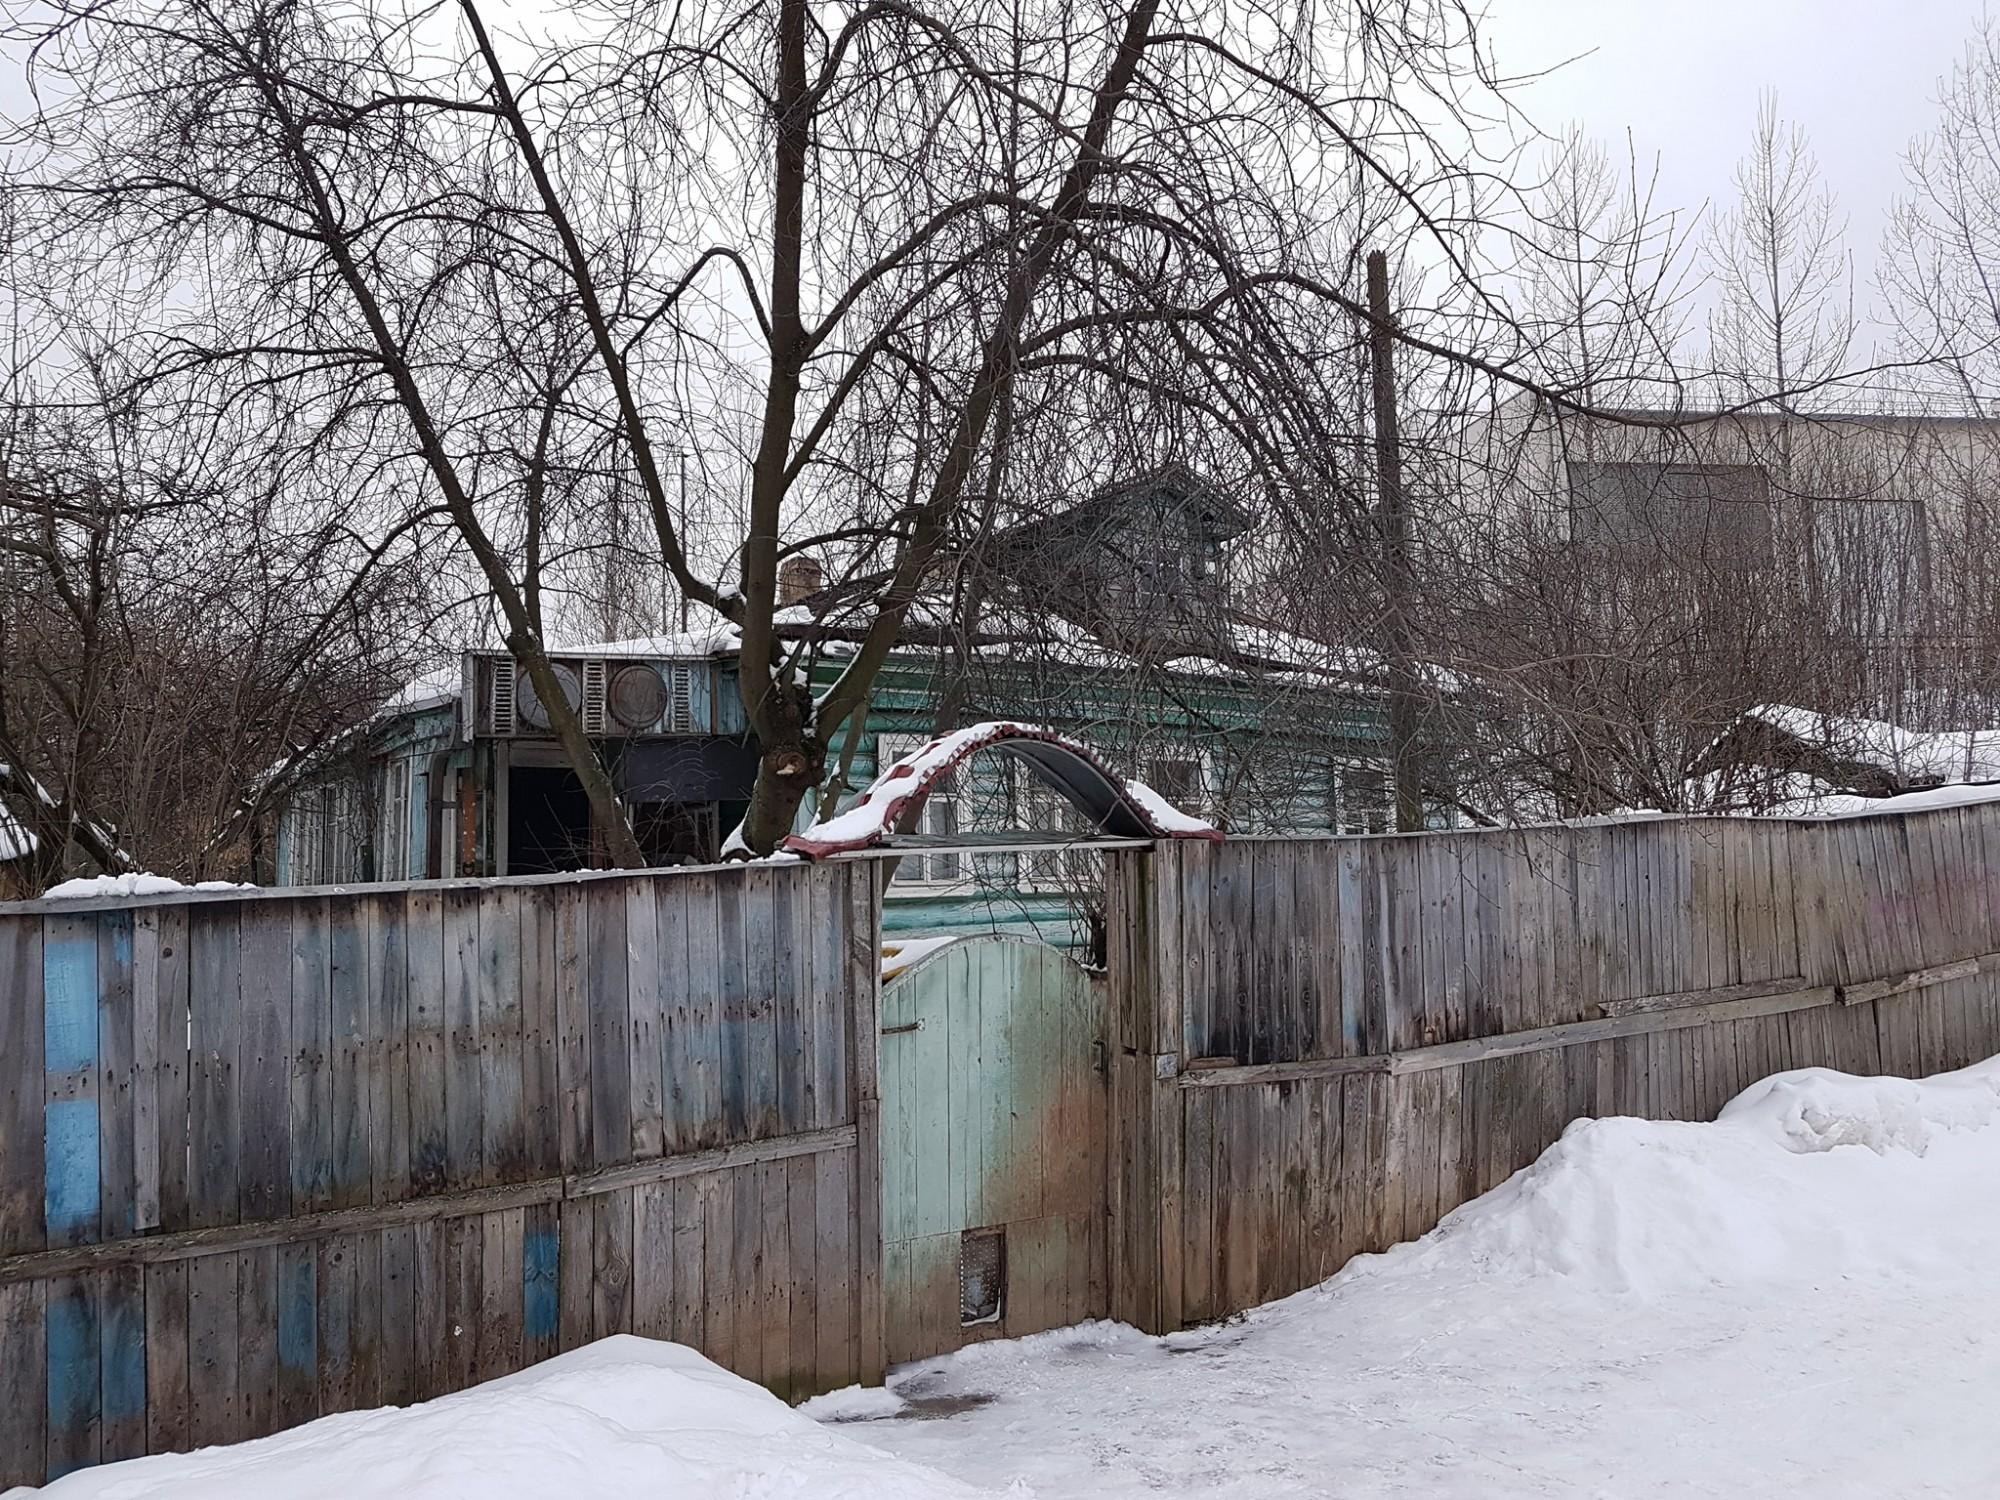 2019 Последний дом деревни Матвеевское. Александр Кутенков.